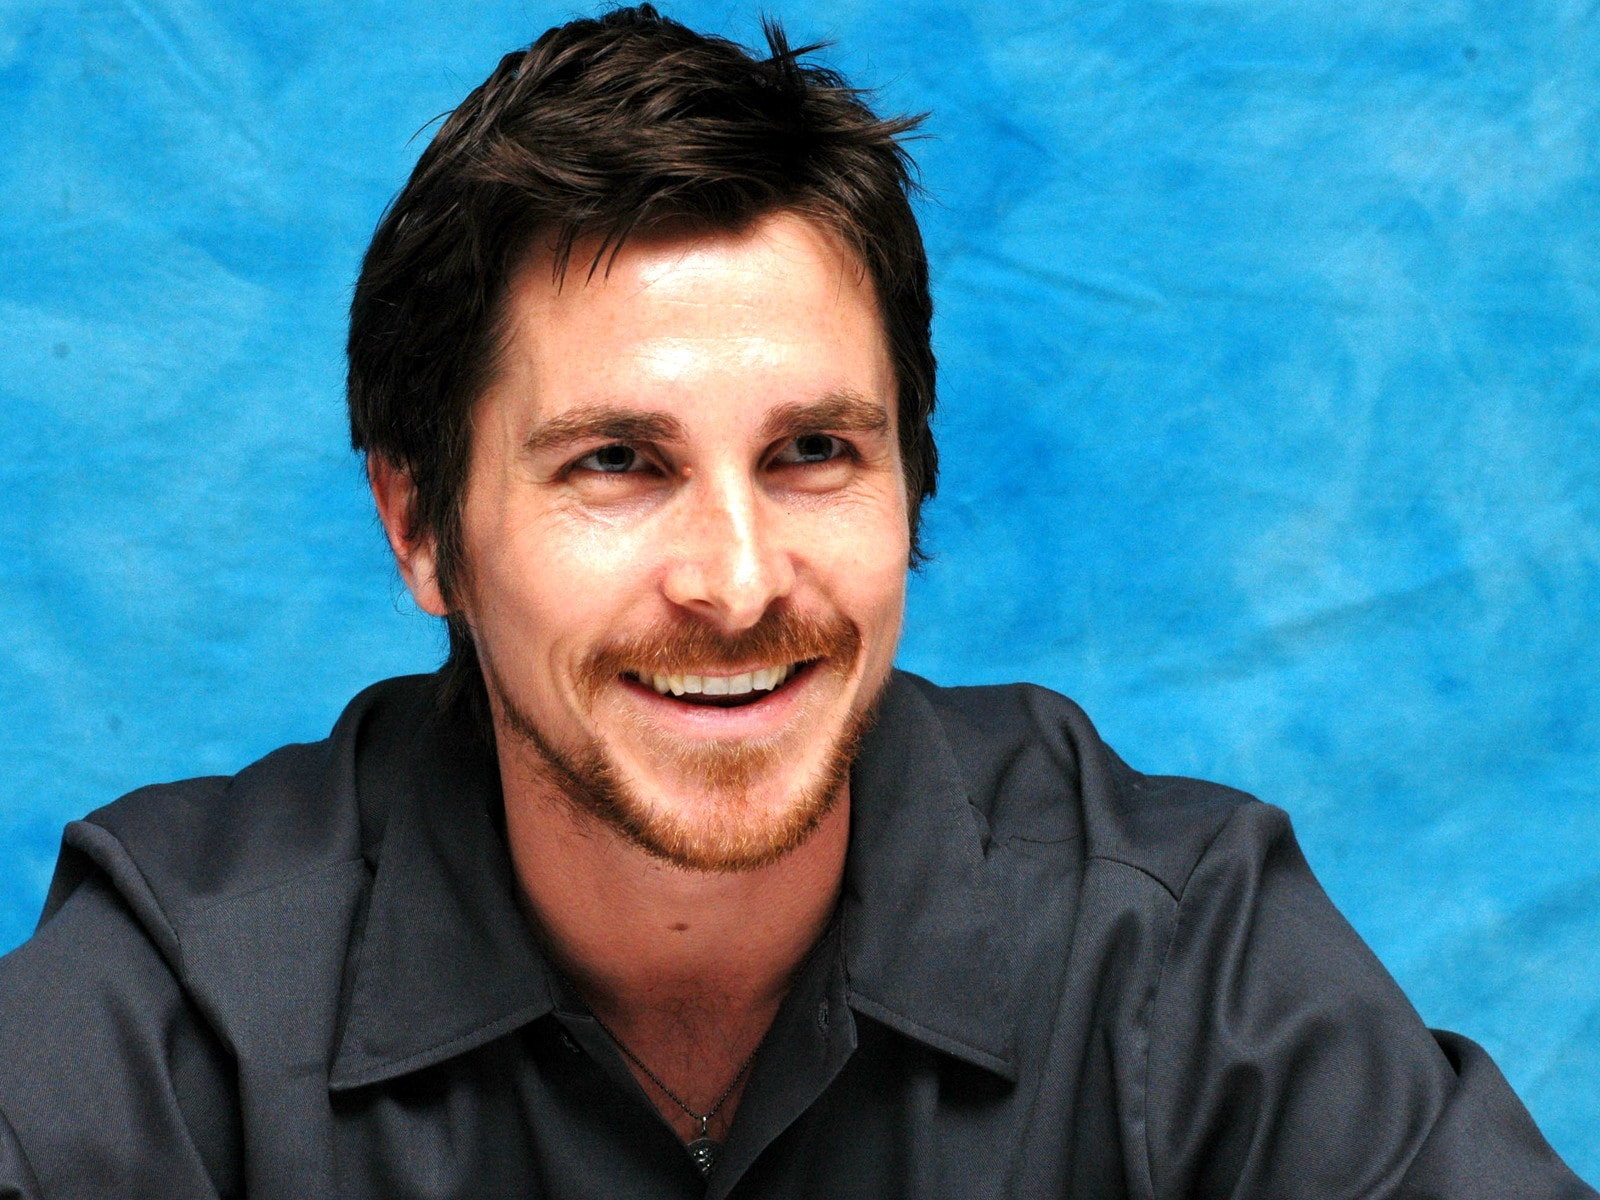 Christian Bale HD pics